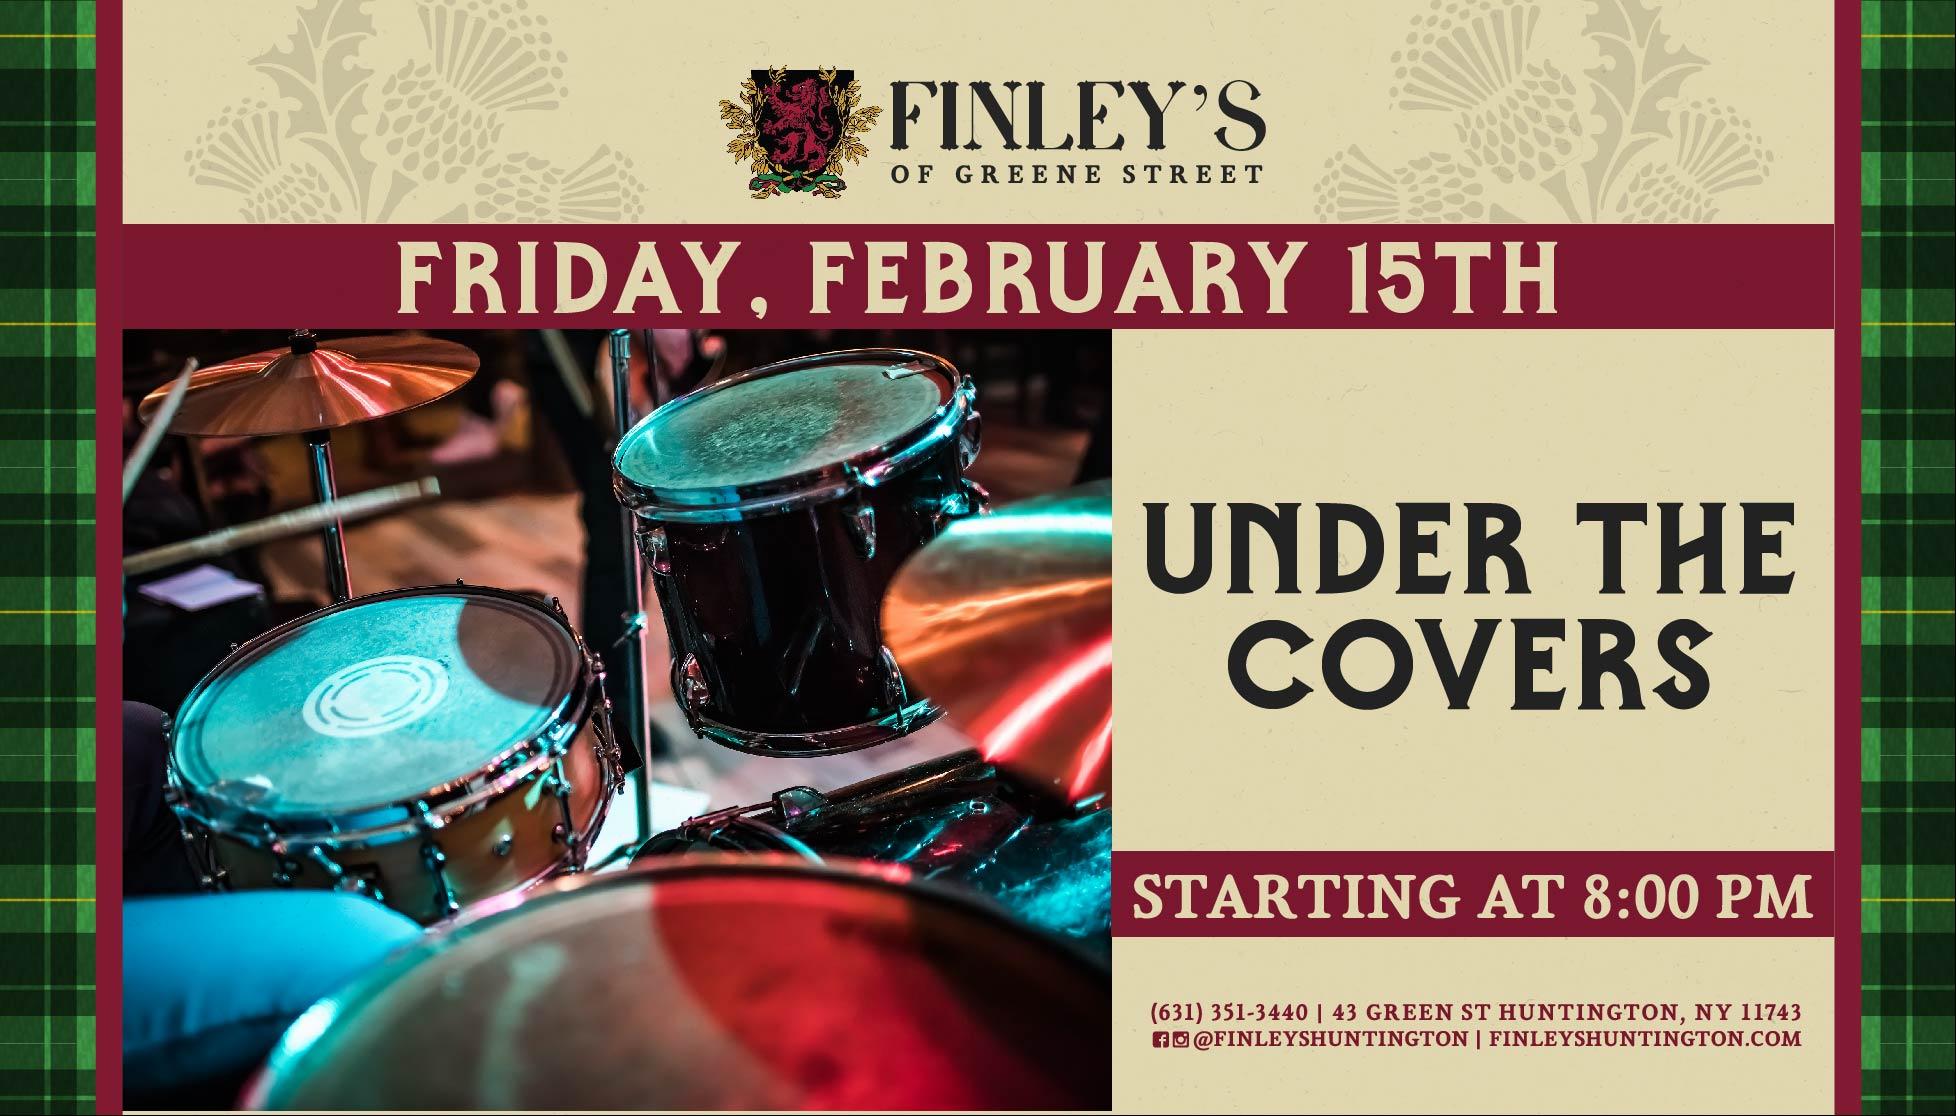 Feb15_underthecovers.jpg